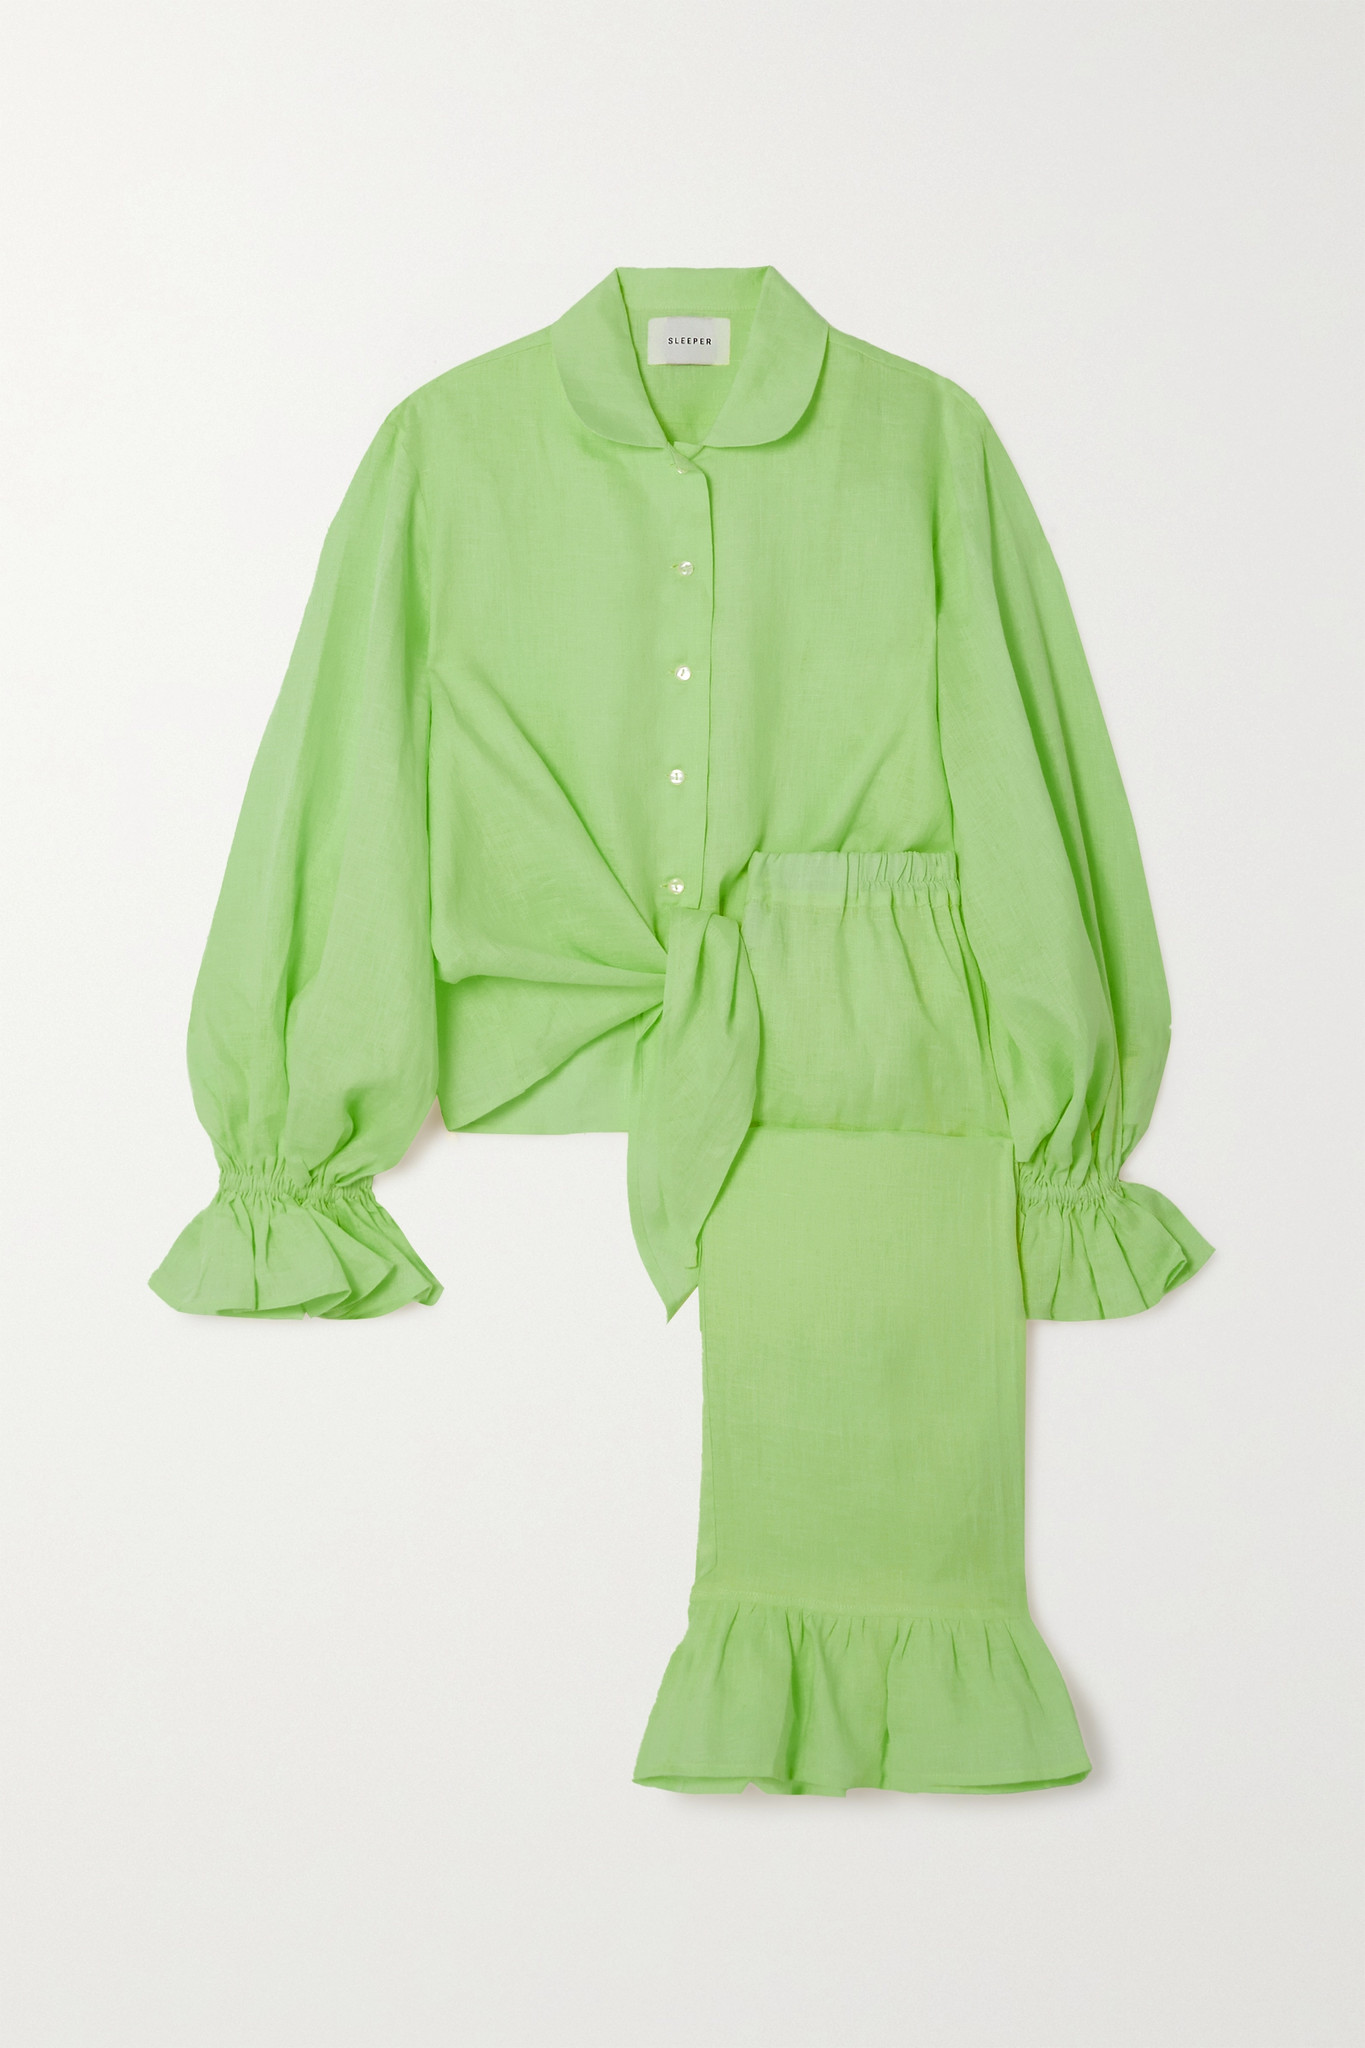 SLEEPER - Rumba Ruffled Linen Shirt And Pants Set - Green - small